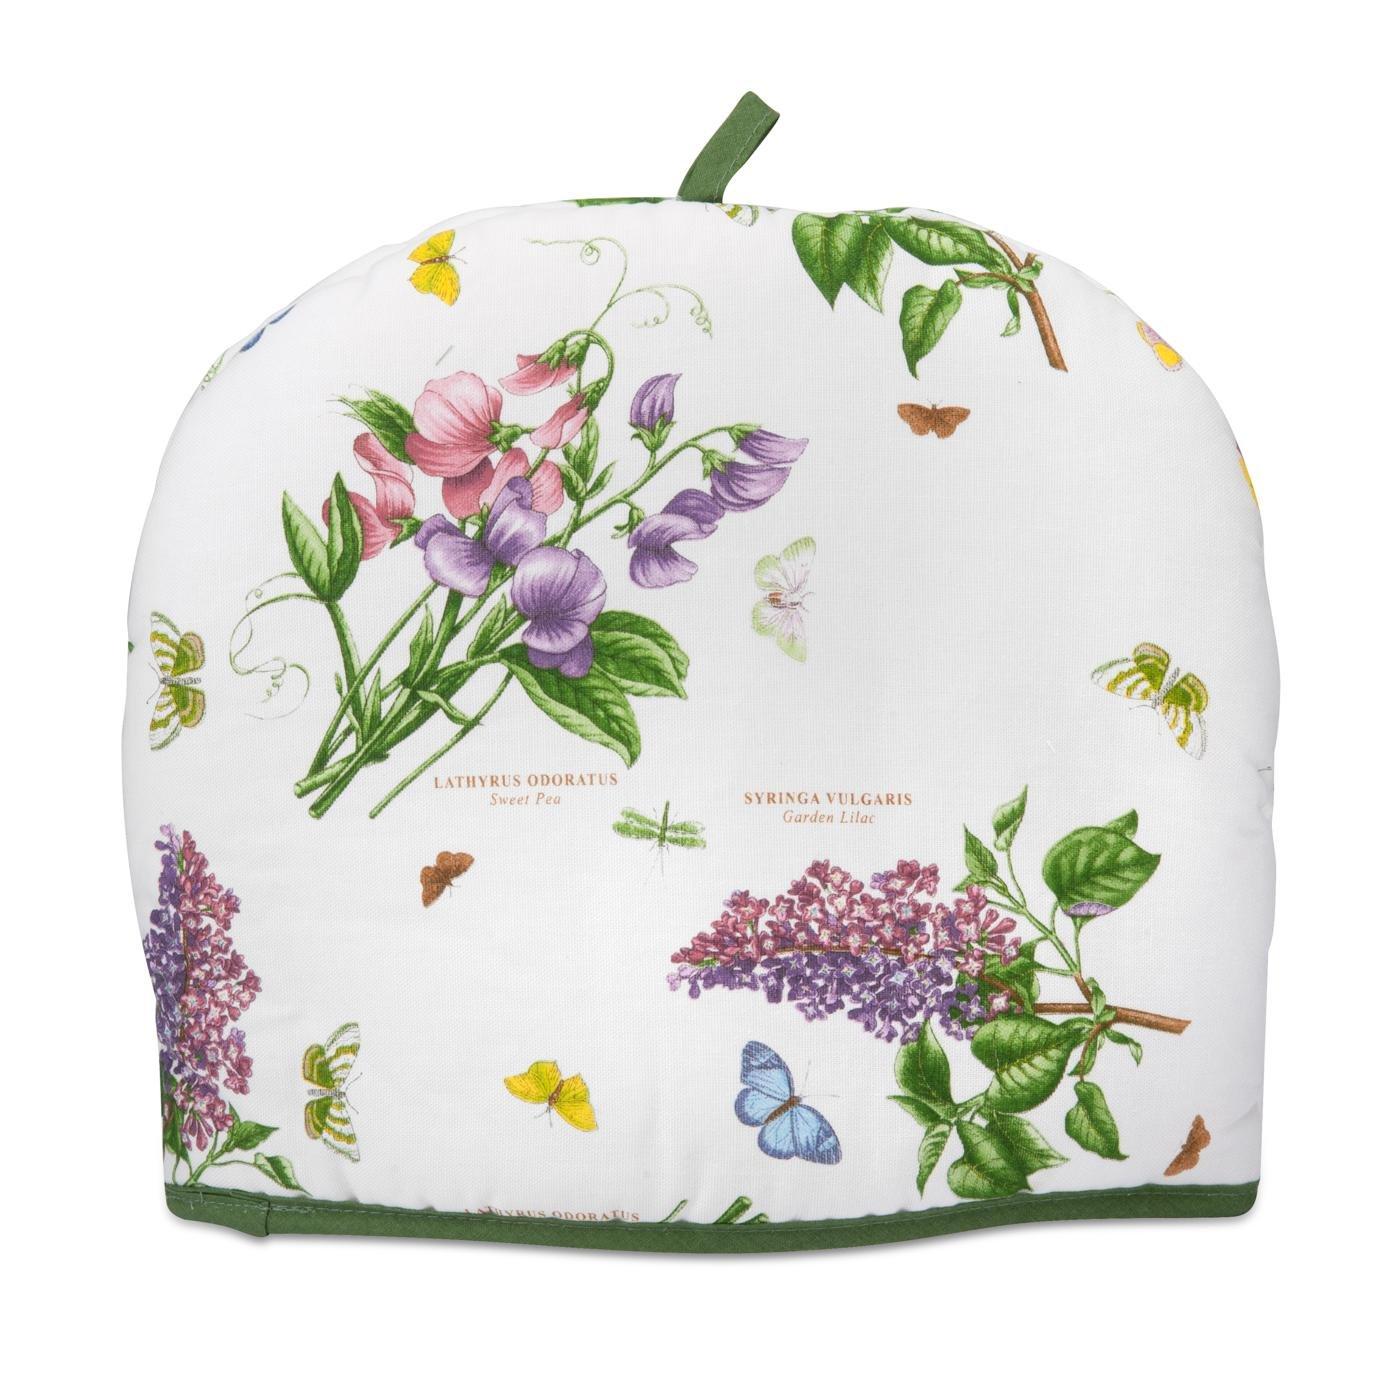 Portmeirion Botanic Garden Tea Cosy Pimpernel X0015168013